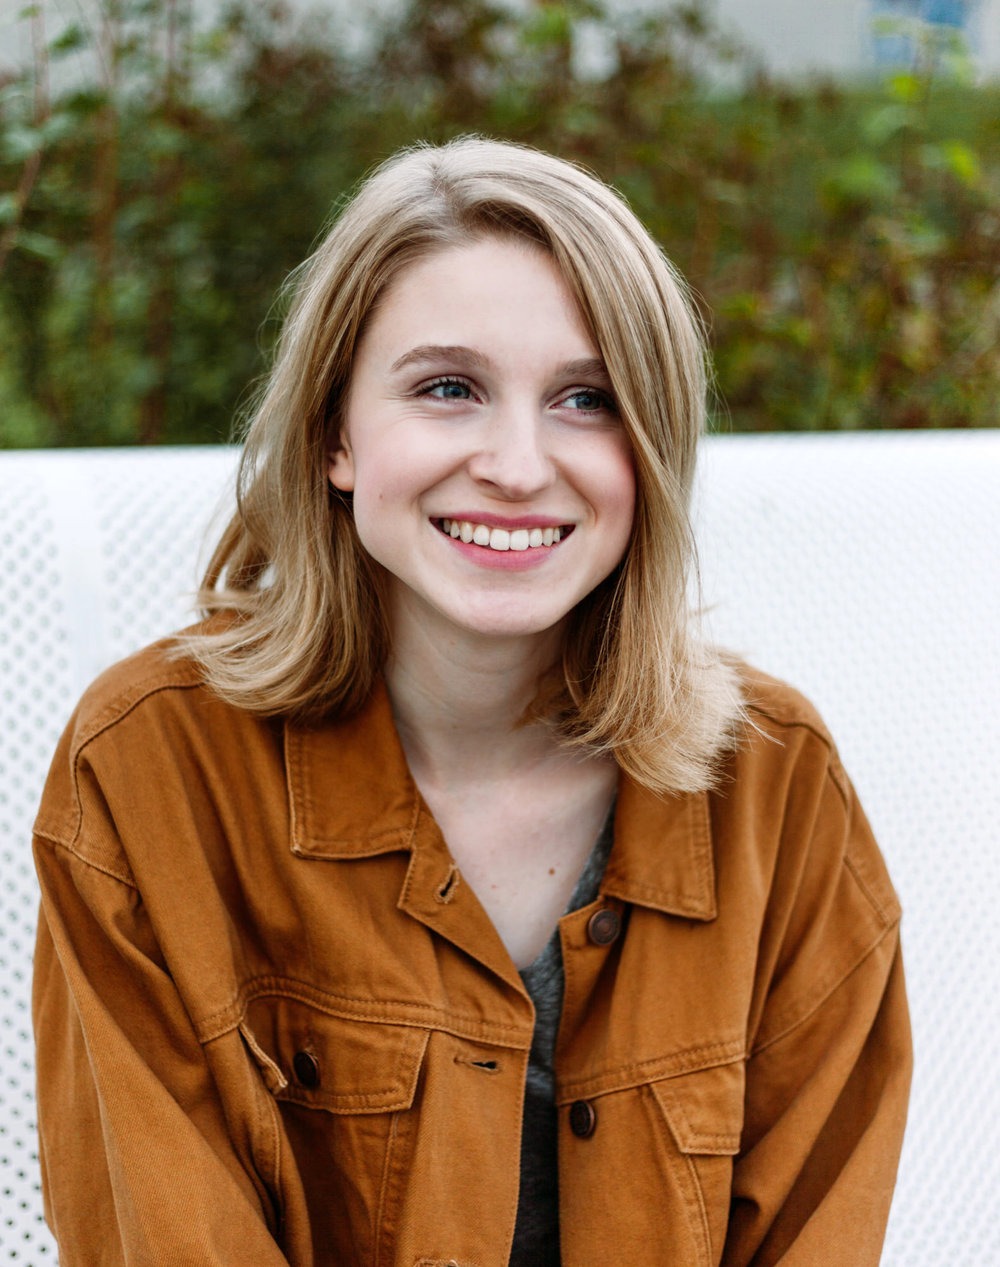 LaurenSenior-HaleyMcLain11.JPG